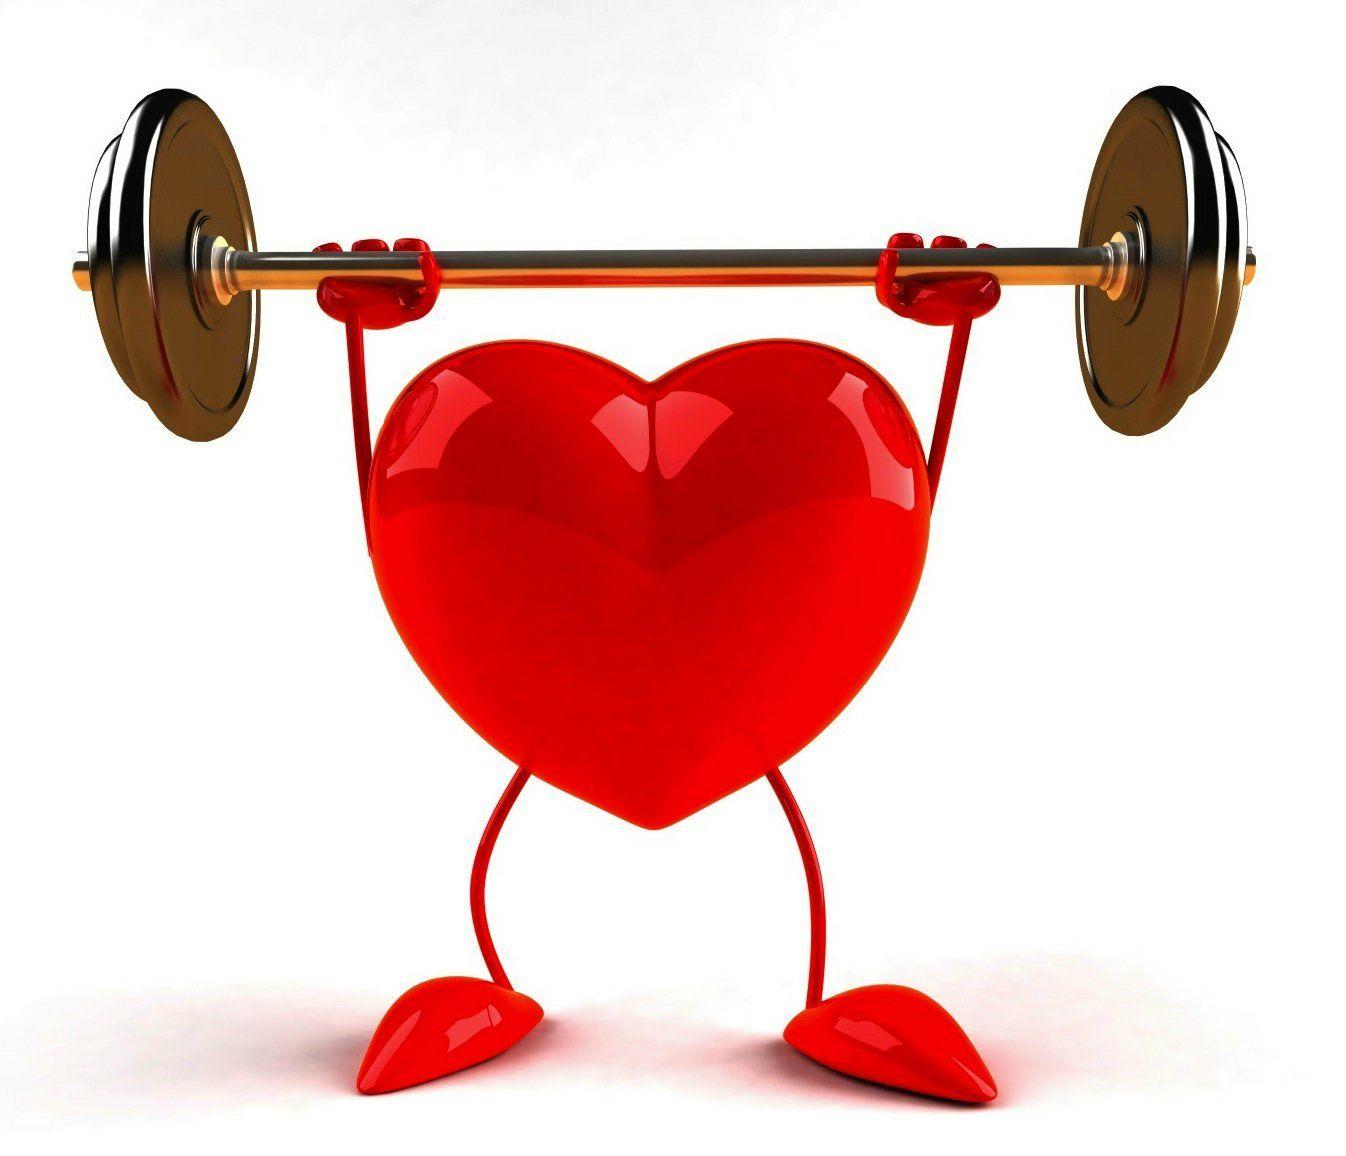 heart-health-health